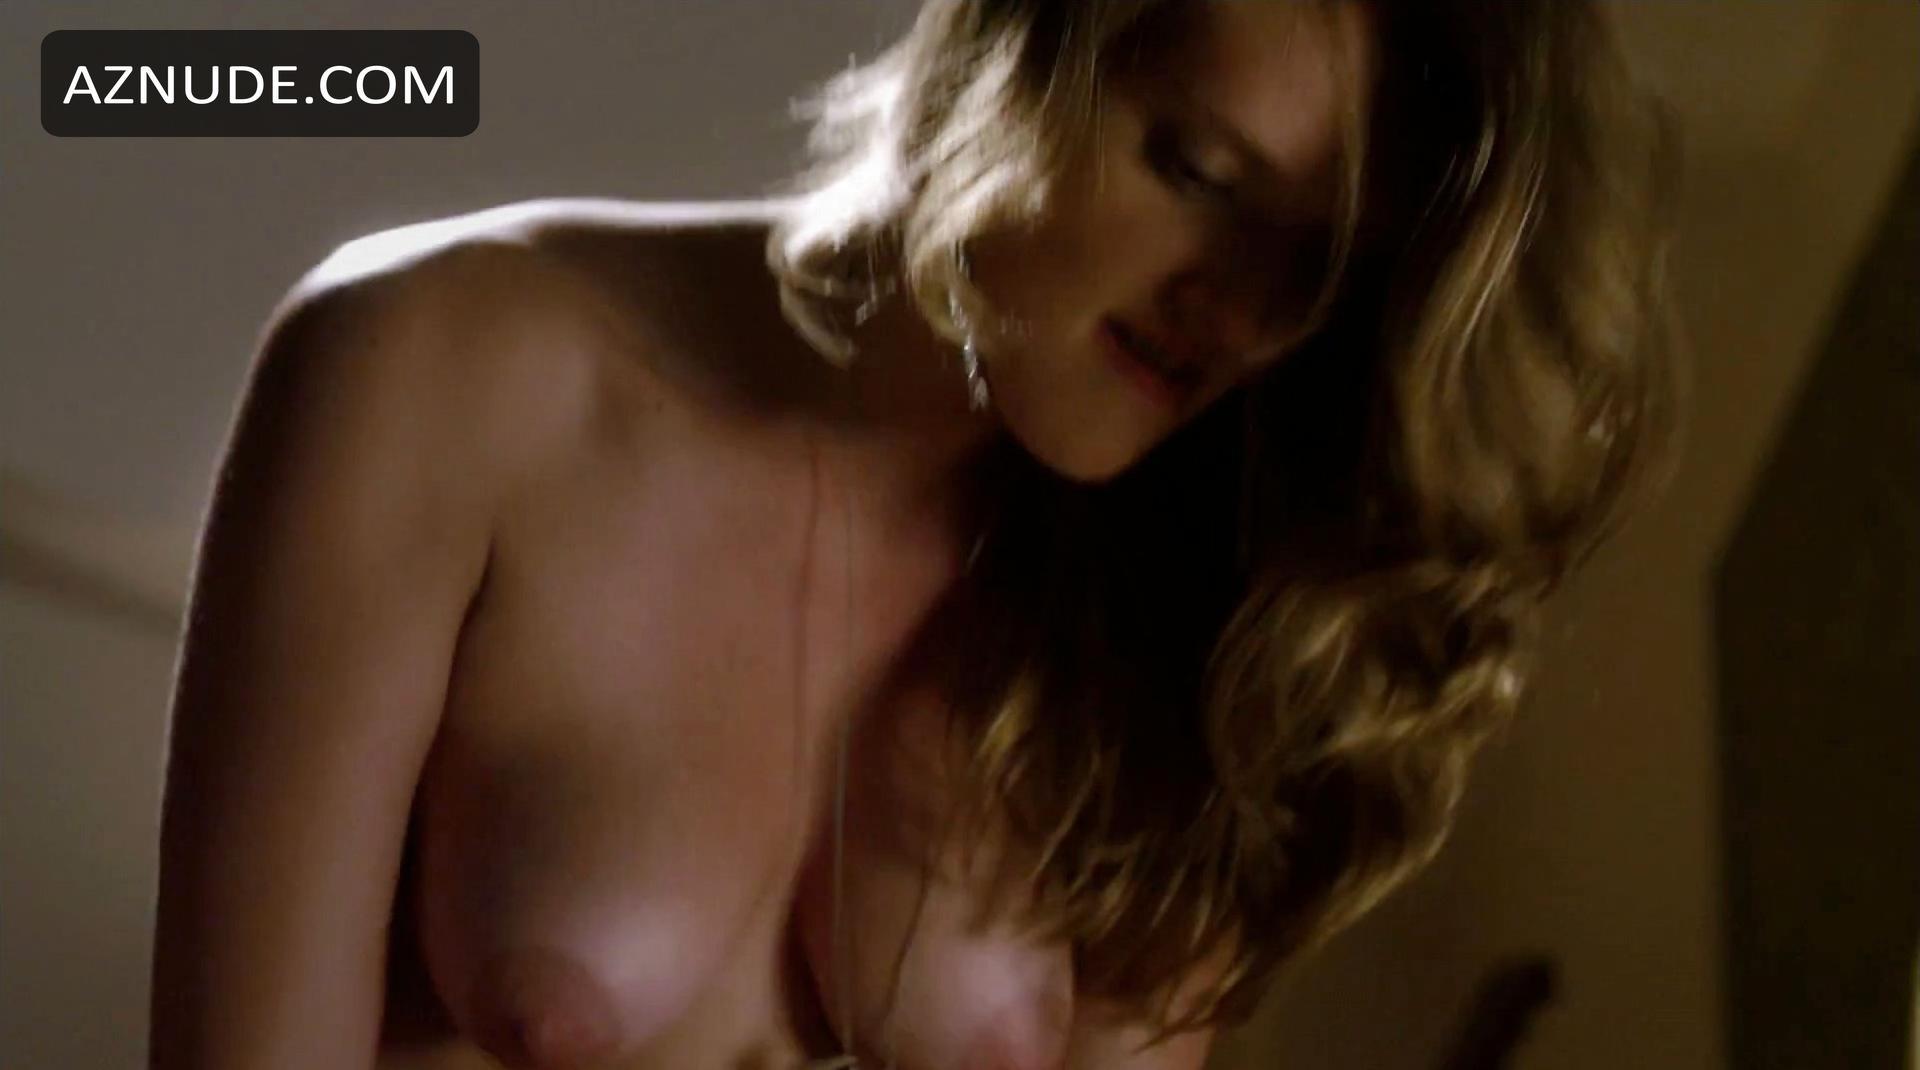 Justine joli in sexy assassins 2012 - 1 part 2